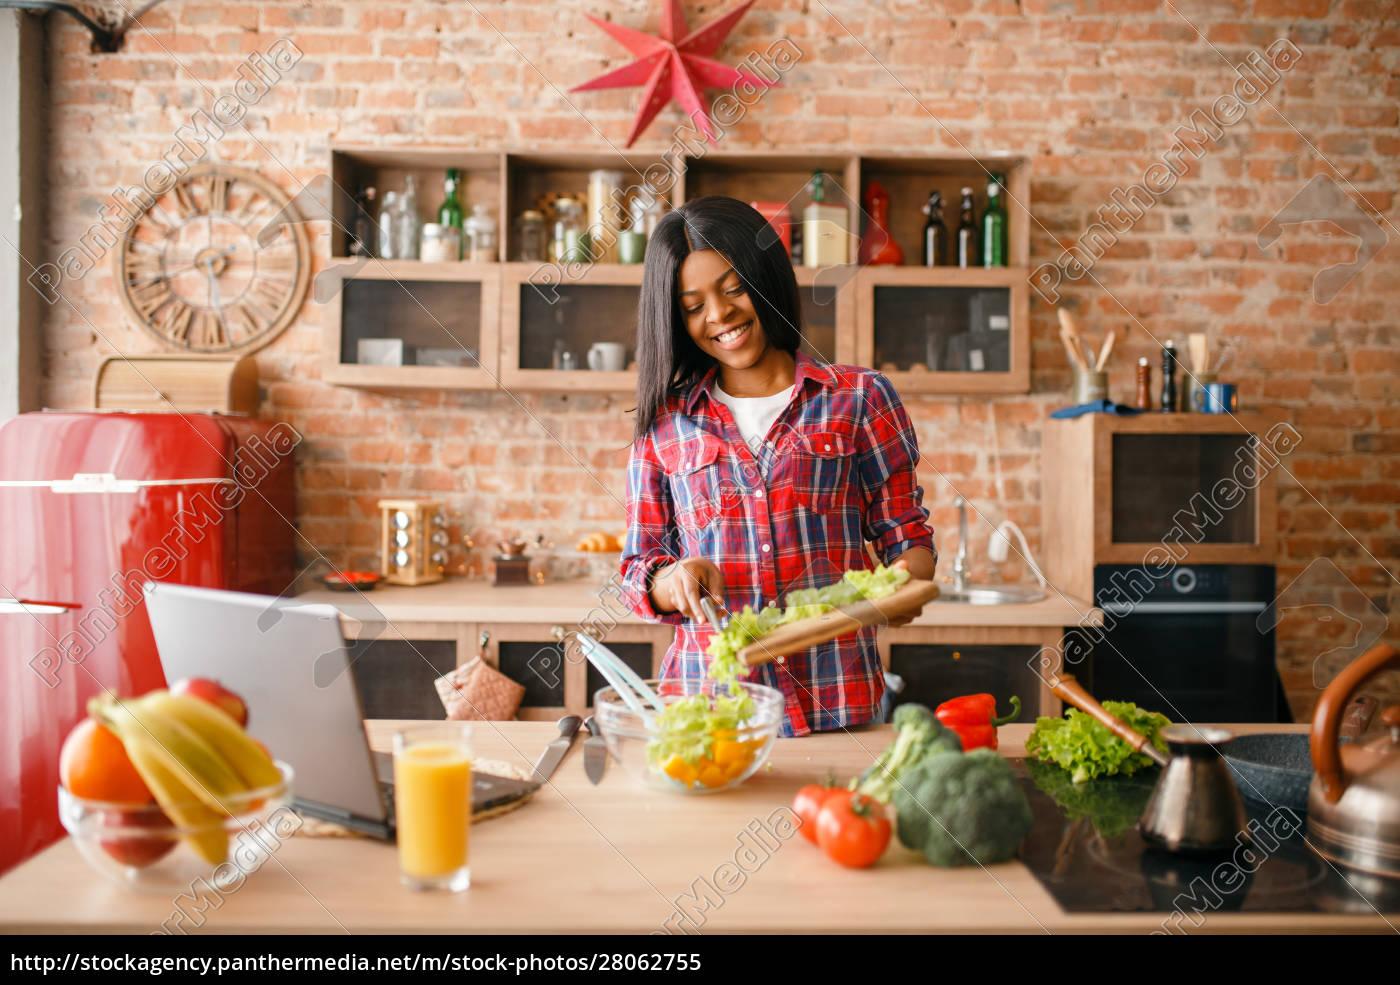 black, woman, looking, recipe, on, laptop - 28062755